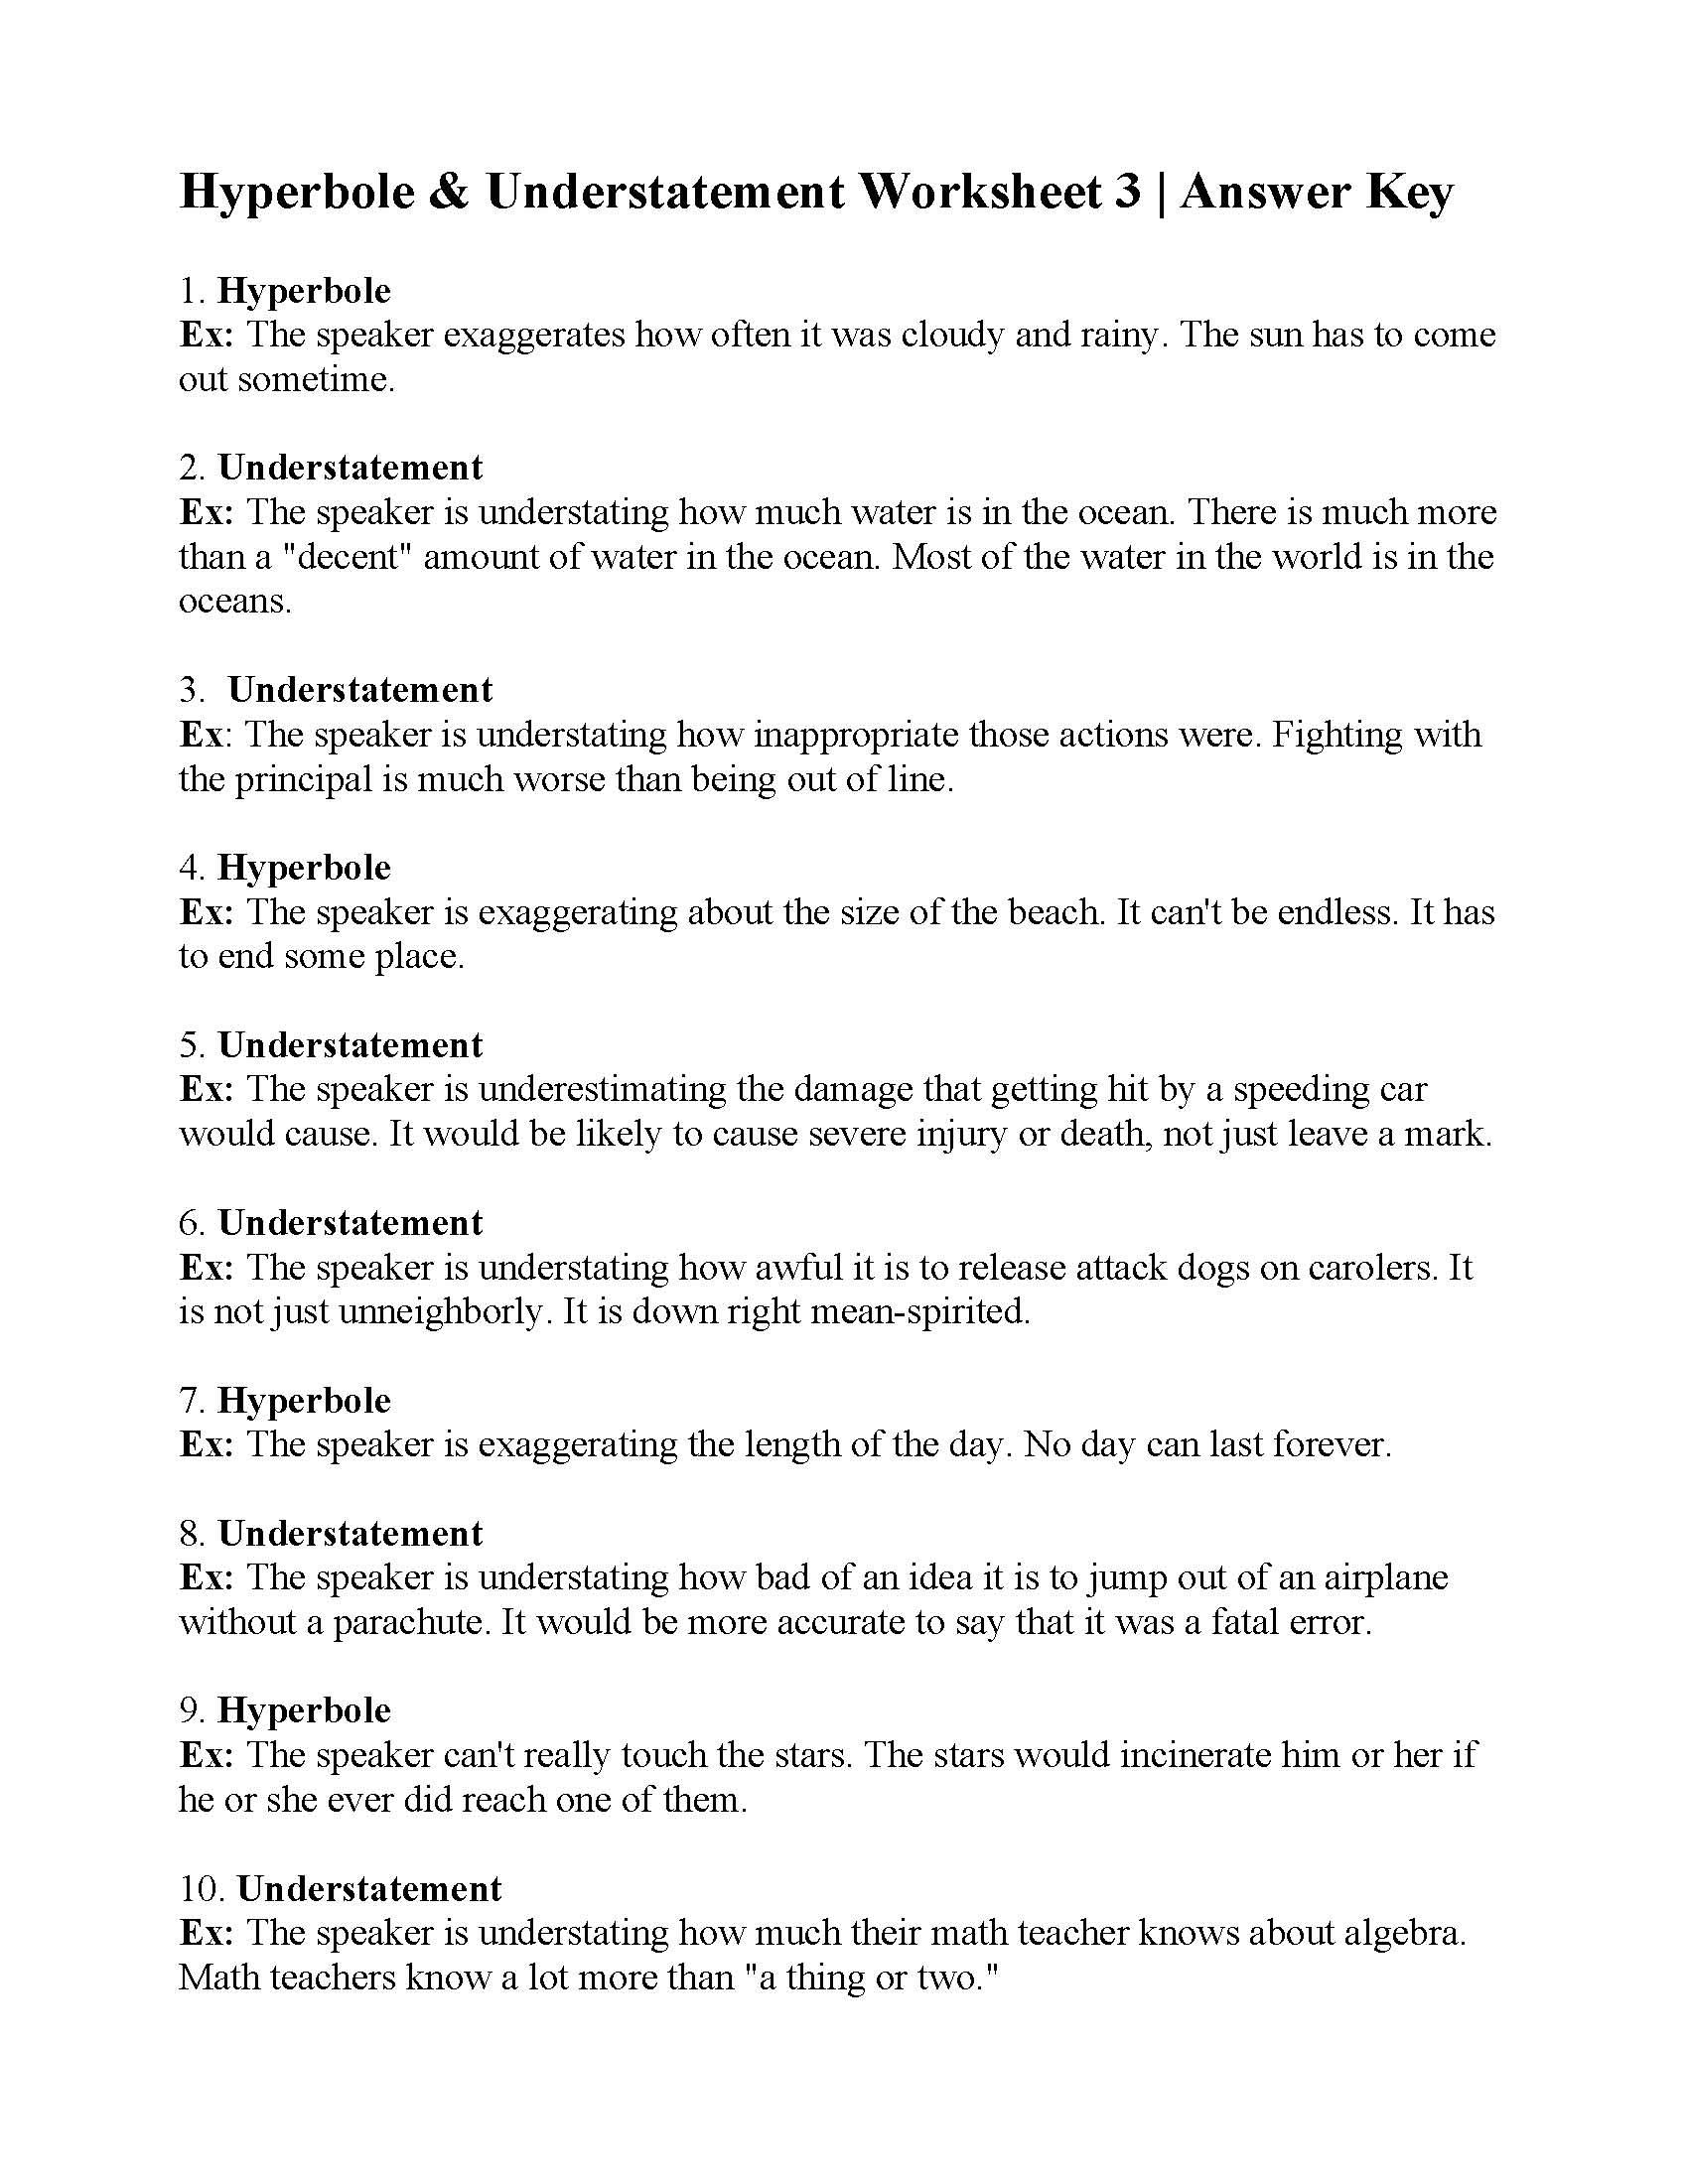 Hyperbole and Understatement Worksheet 3 | Answers